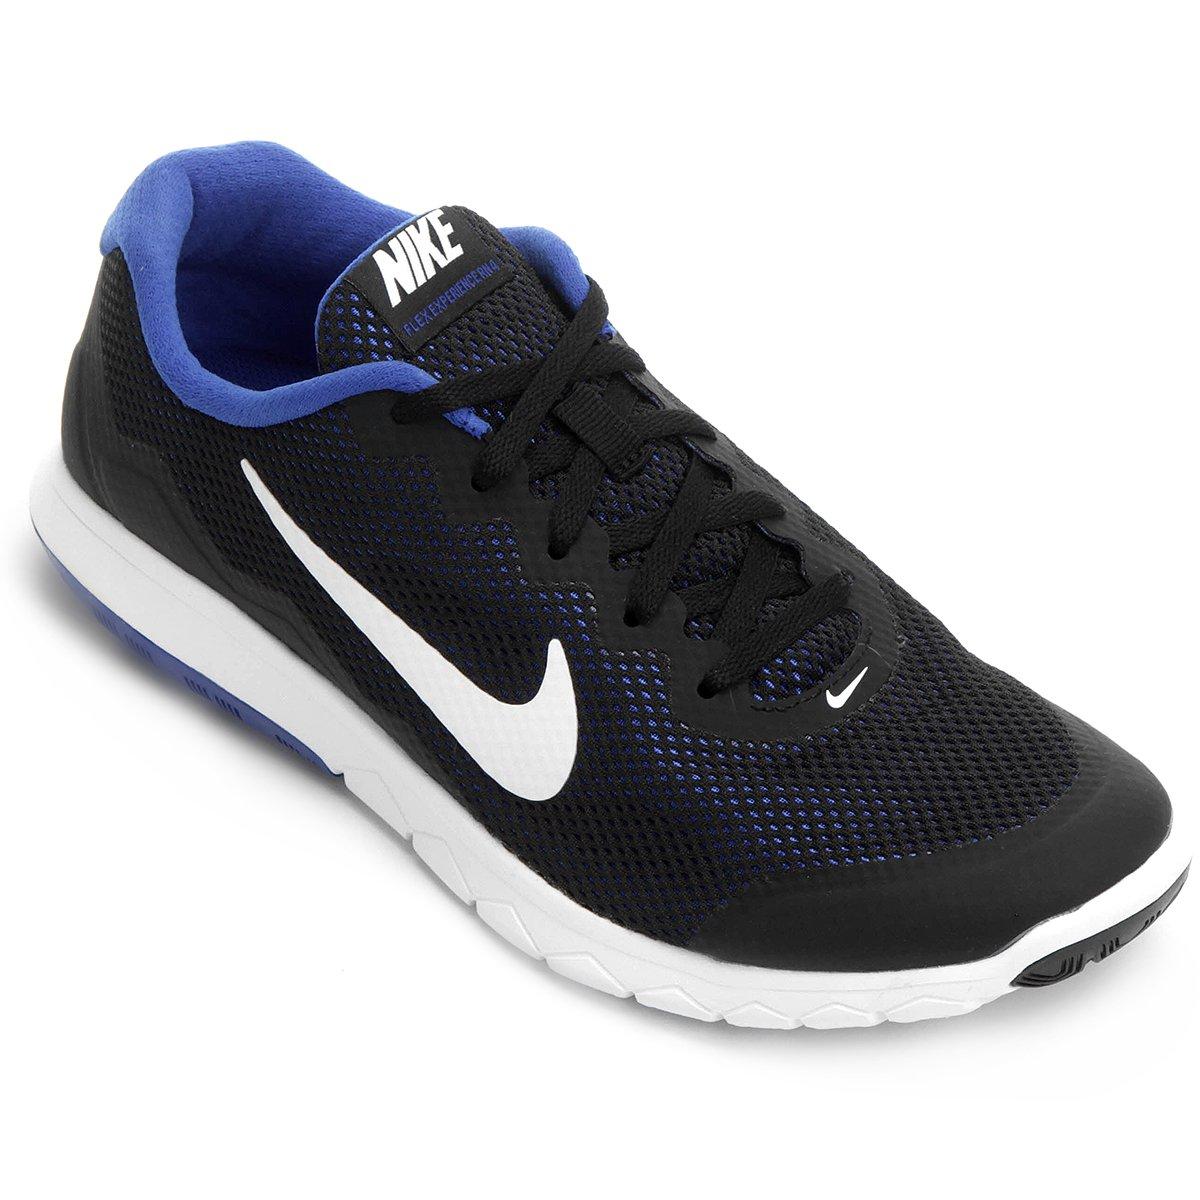 bd1ce24595a74 Tênis Nike Flex Experience RN 4 Masculino - Compre Agora